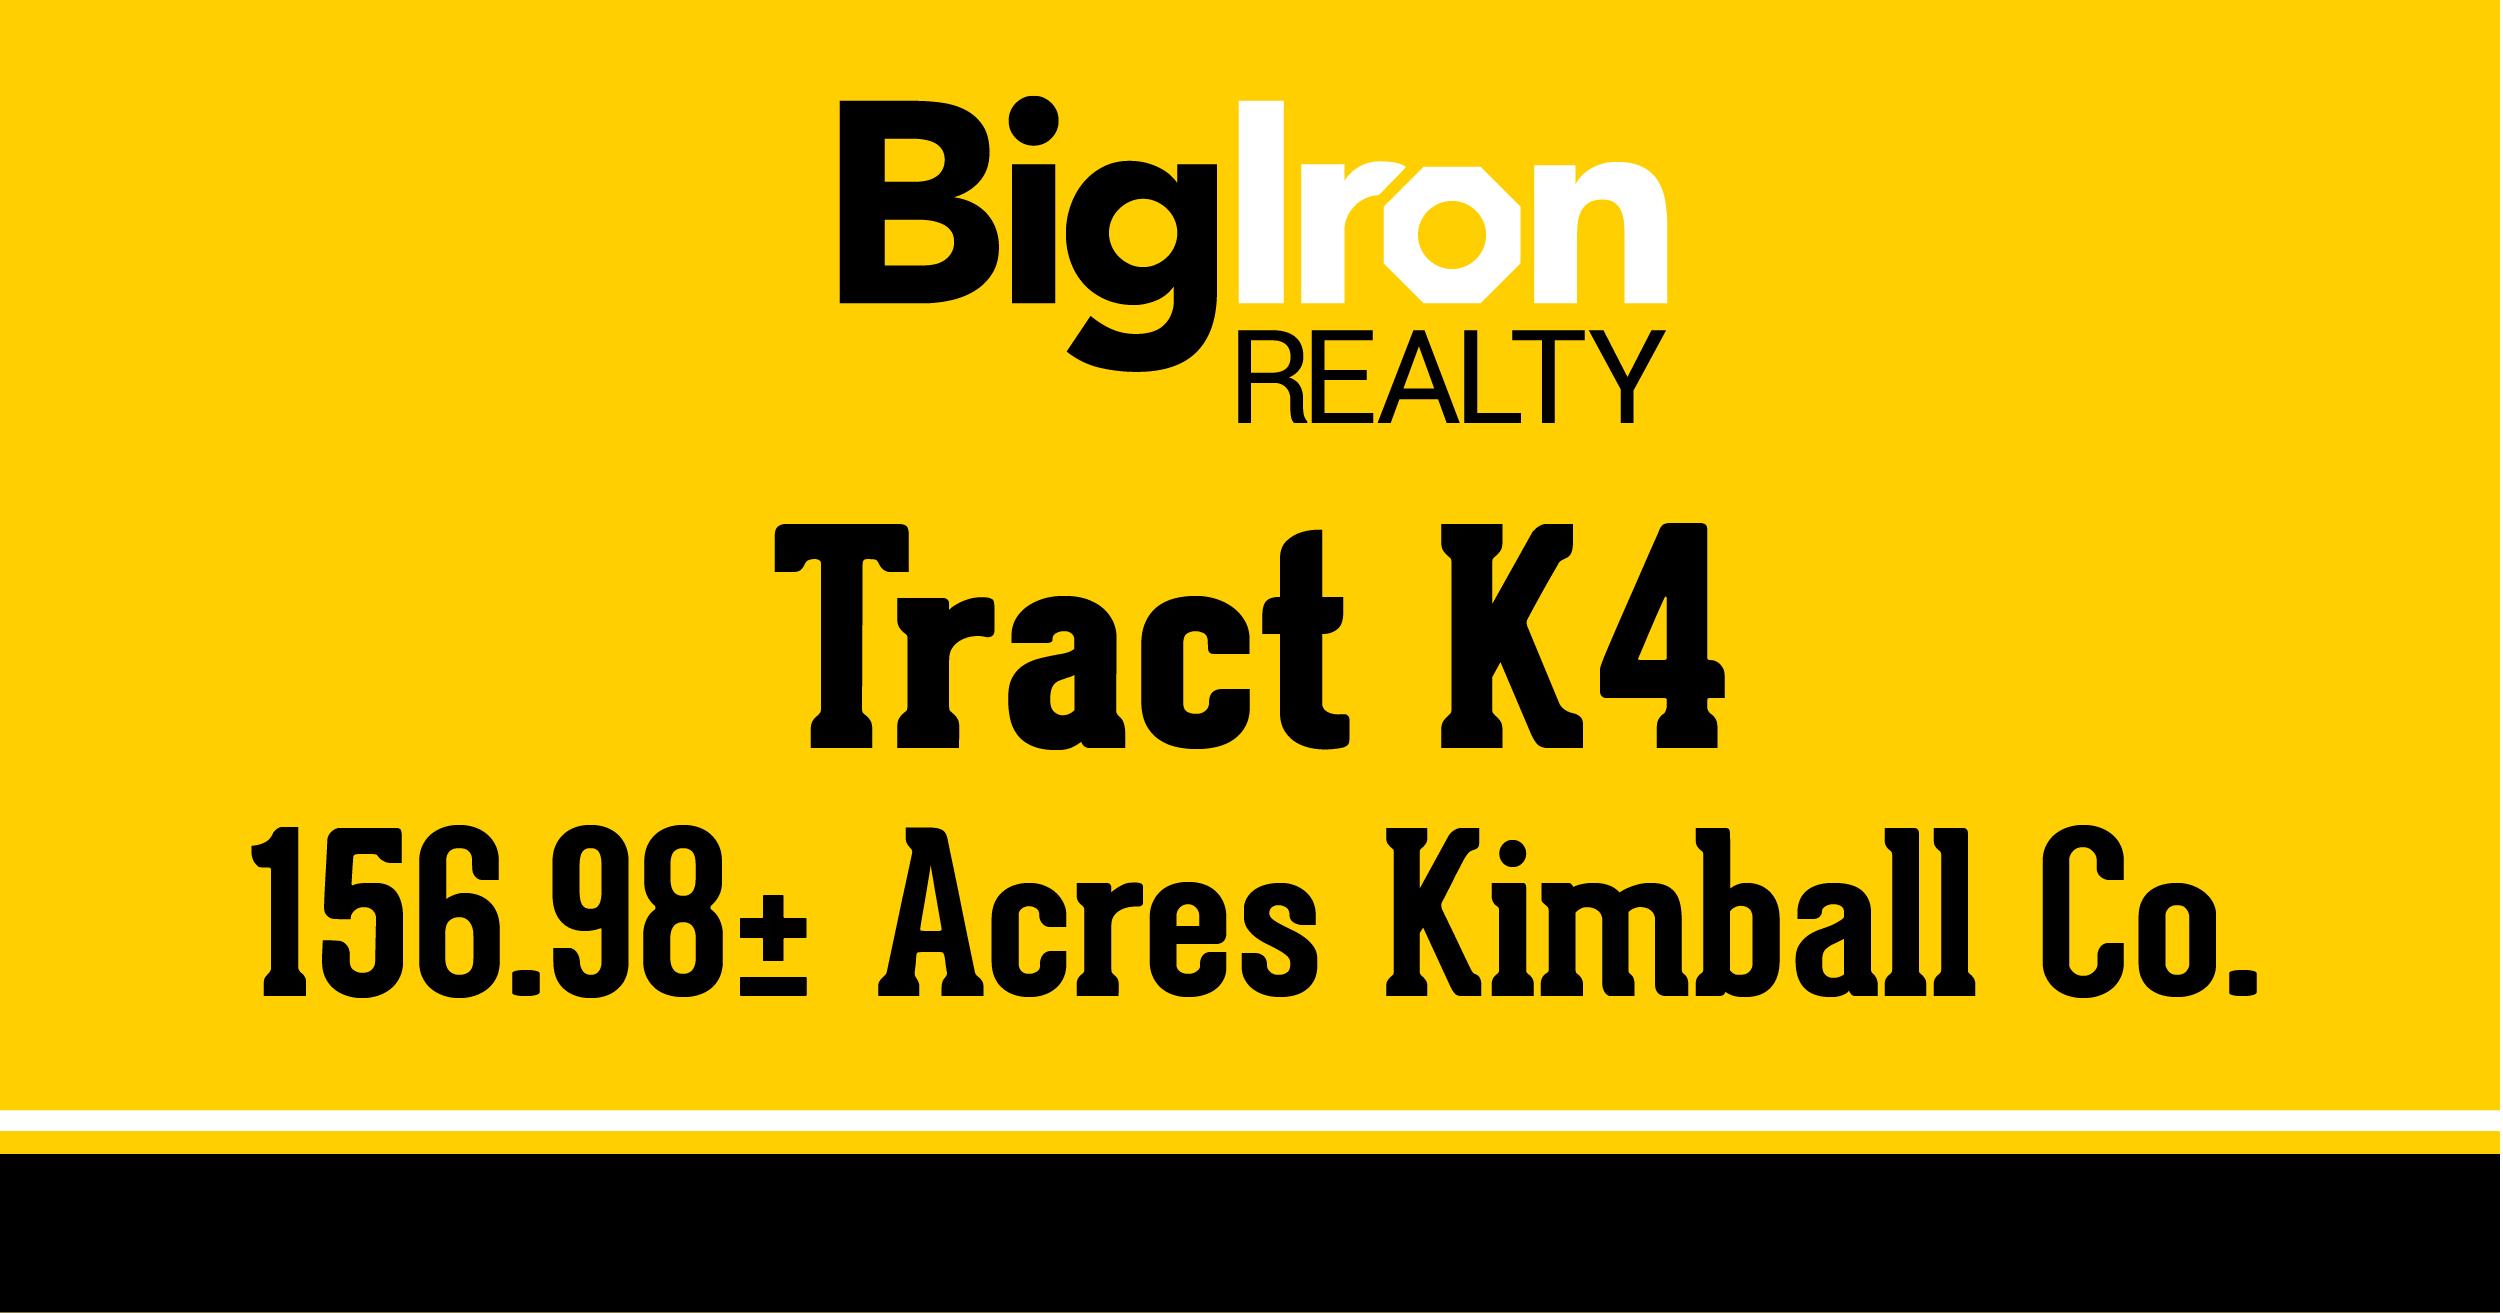 Brockhaus_BIR-93_TractK4-5f2af4c7a0848.jpg